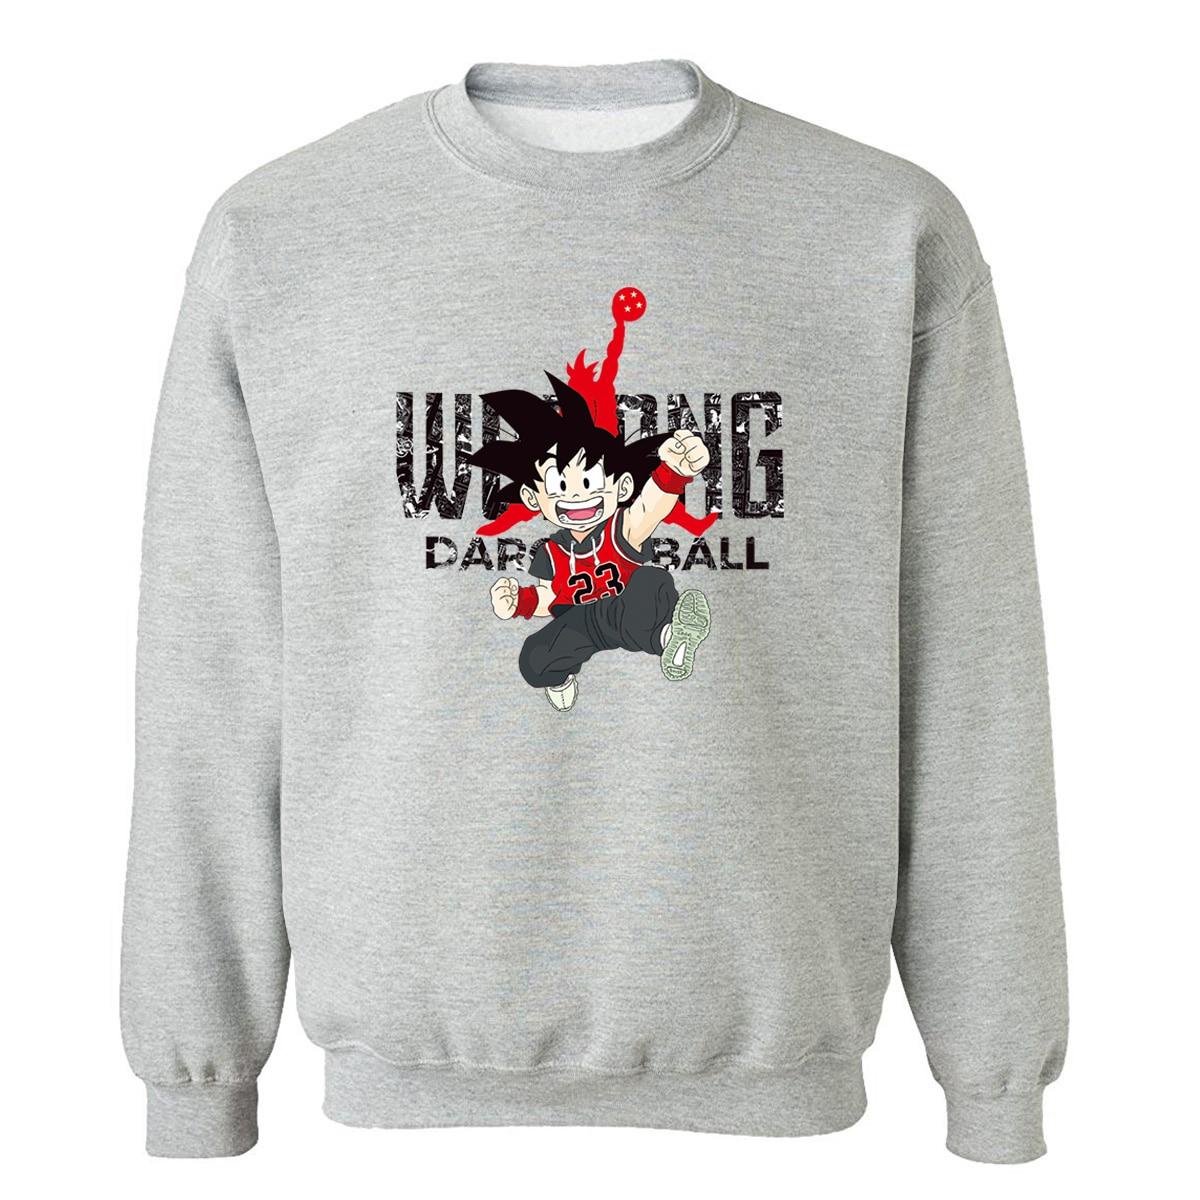 Japanese Anime Dragon Ball Z Men's Sweatshirts 2019 Autumn Winter Fleece Pullover Brand Clothes Streetwear Sweatshirt Men Hoodie